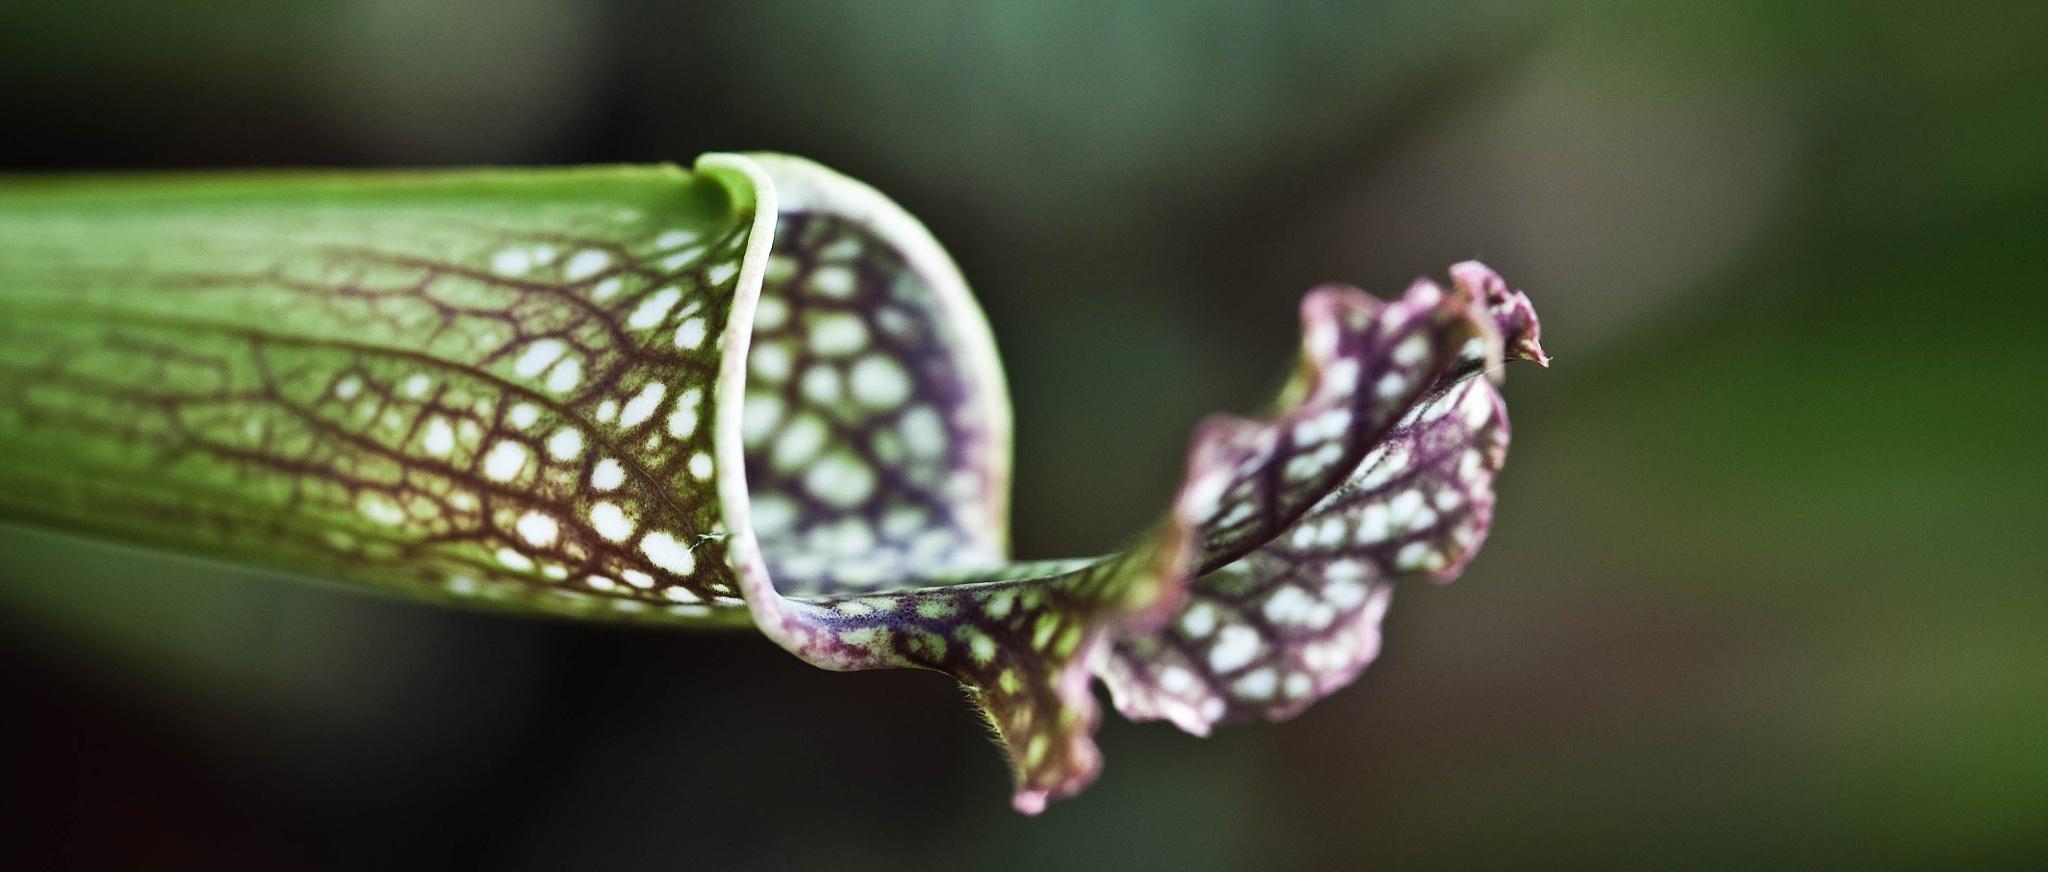 Schlauchpflanze by Stephan Winkler